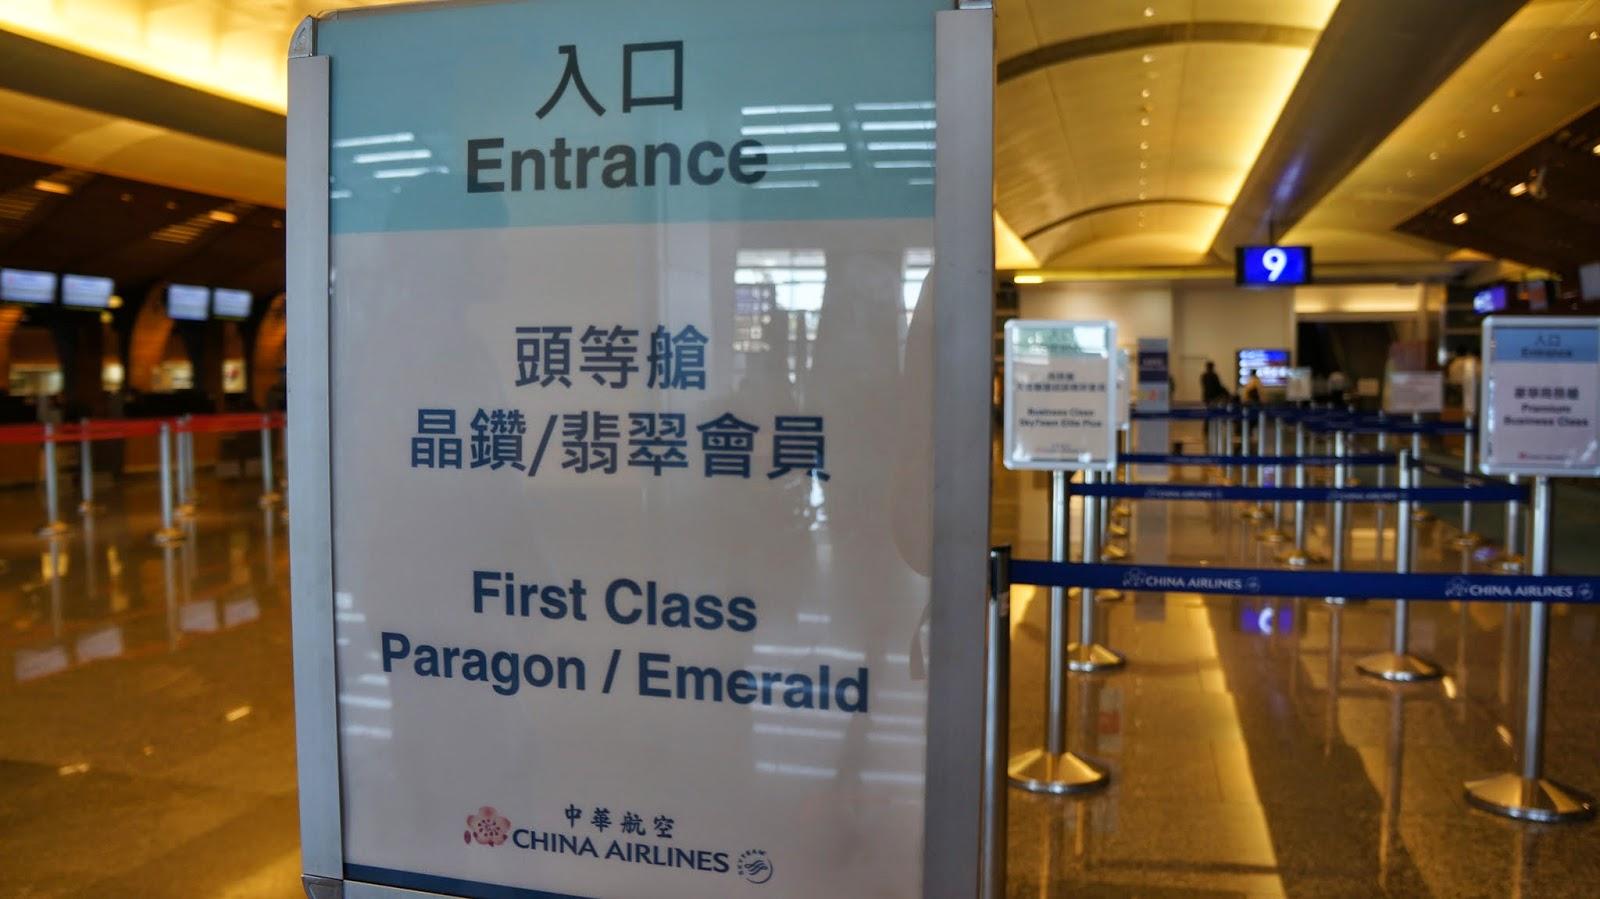 hotelholic: 華航臺北-香港新777-300ER豪華商務艙(China Airlines 777-300ER New Premium Business Class: Taipei-Hong Kong)